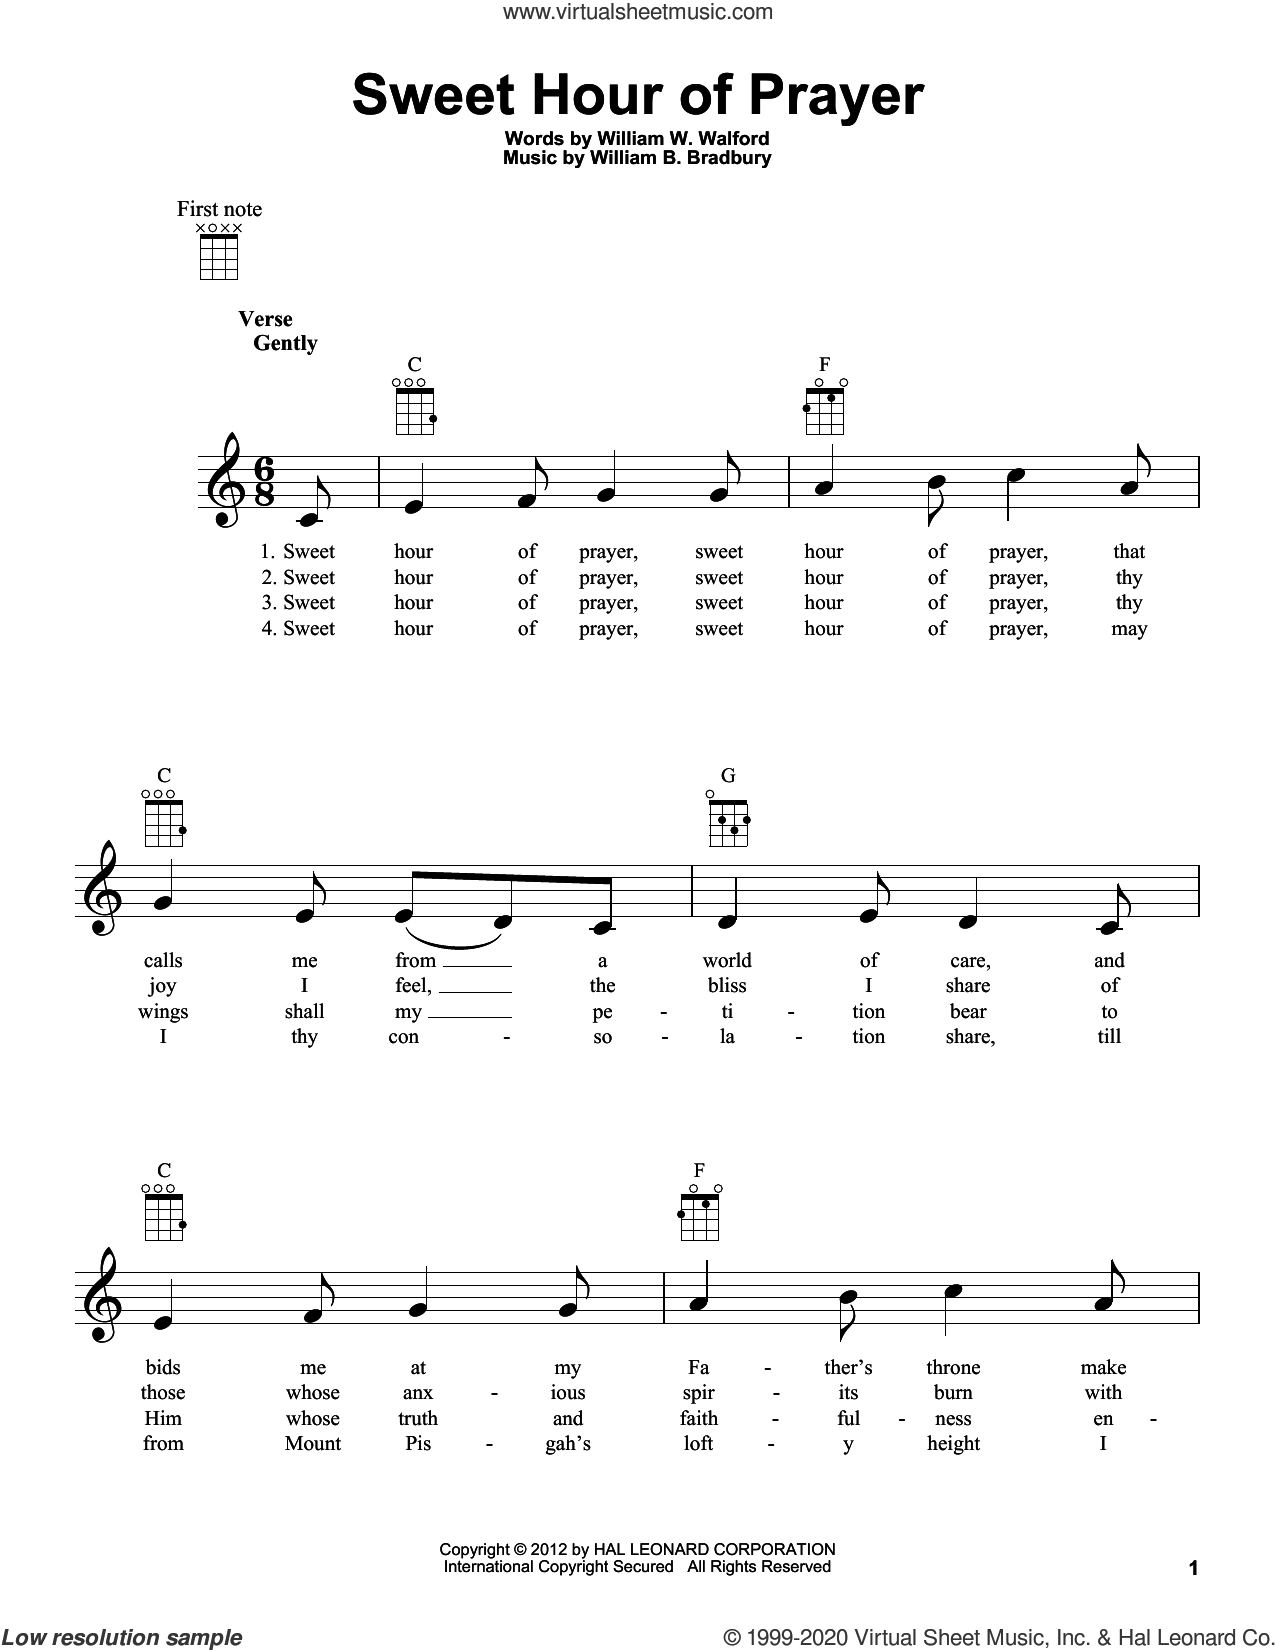 Sweet Hour Of Prayer sheet music for ukulele by William B. Bradbury, William W. Walford and William W. Walford and William B. Bradbury, intermediate skill level